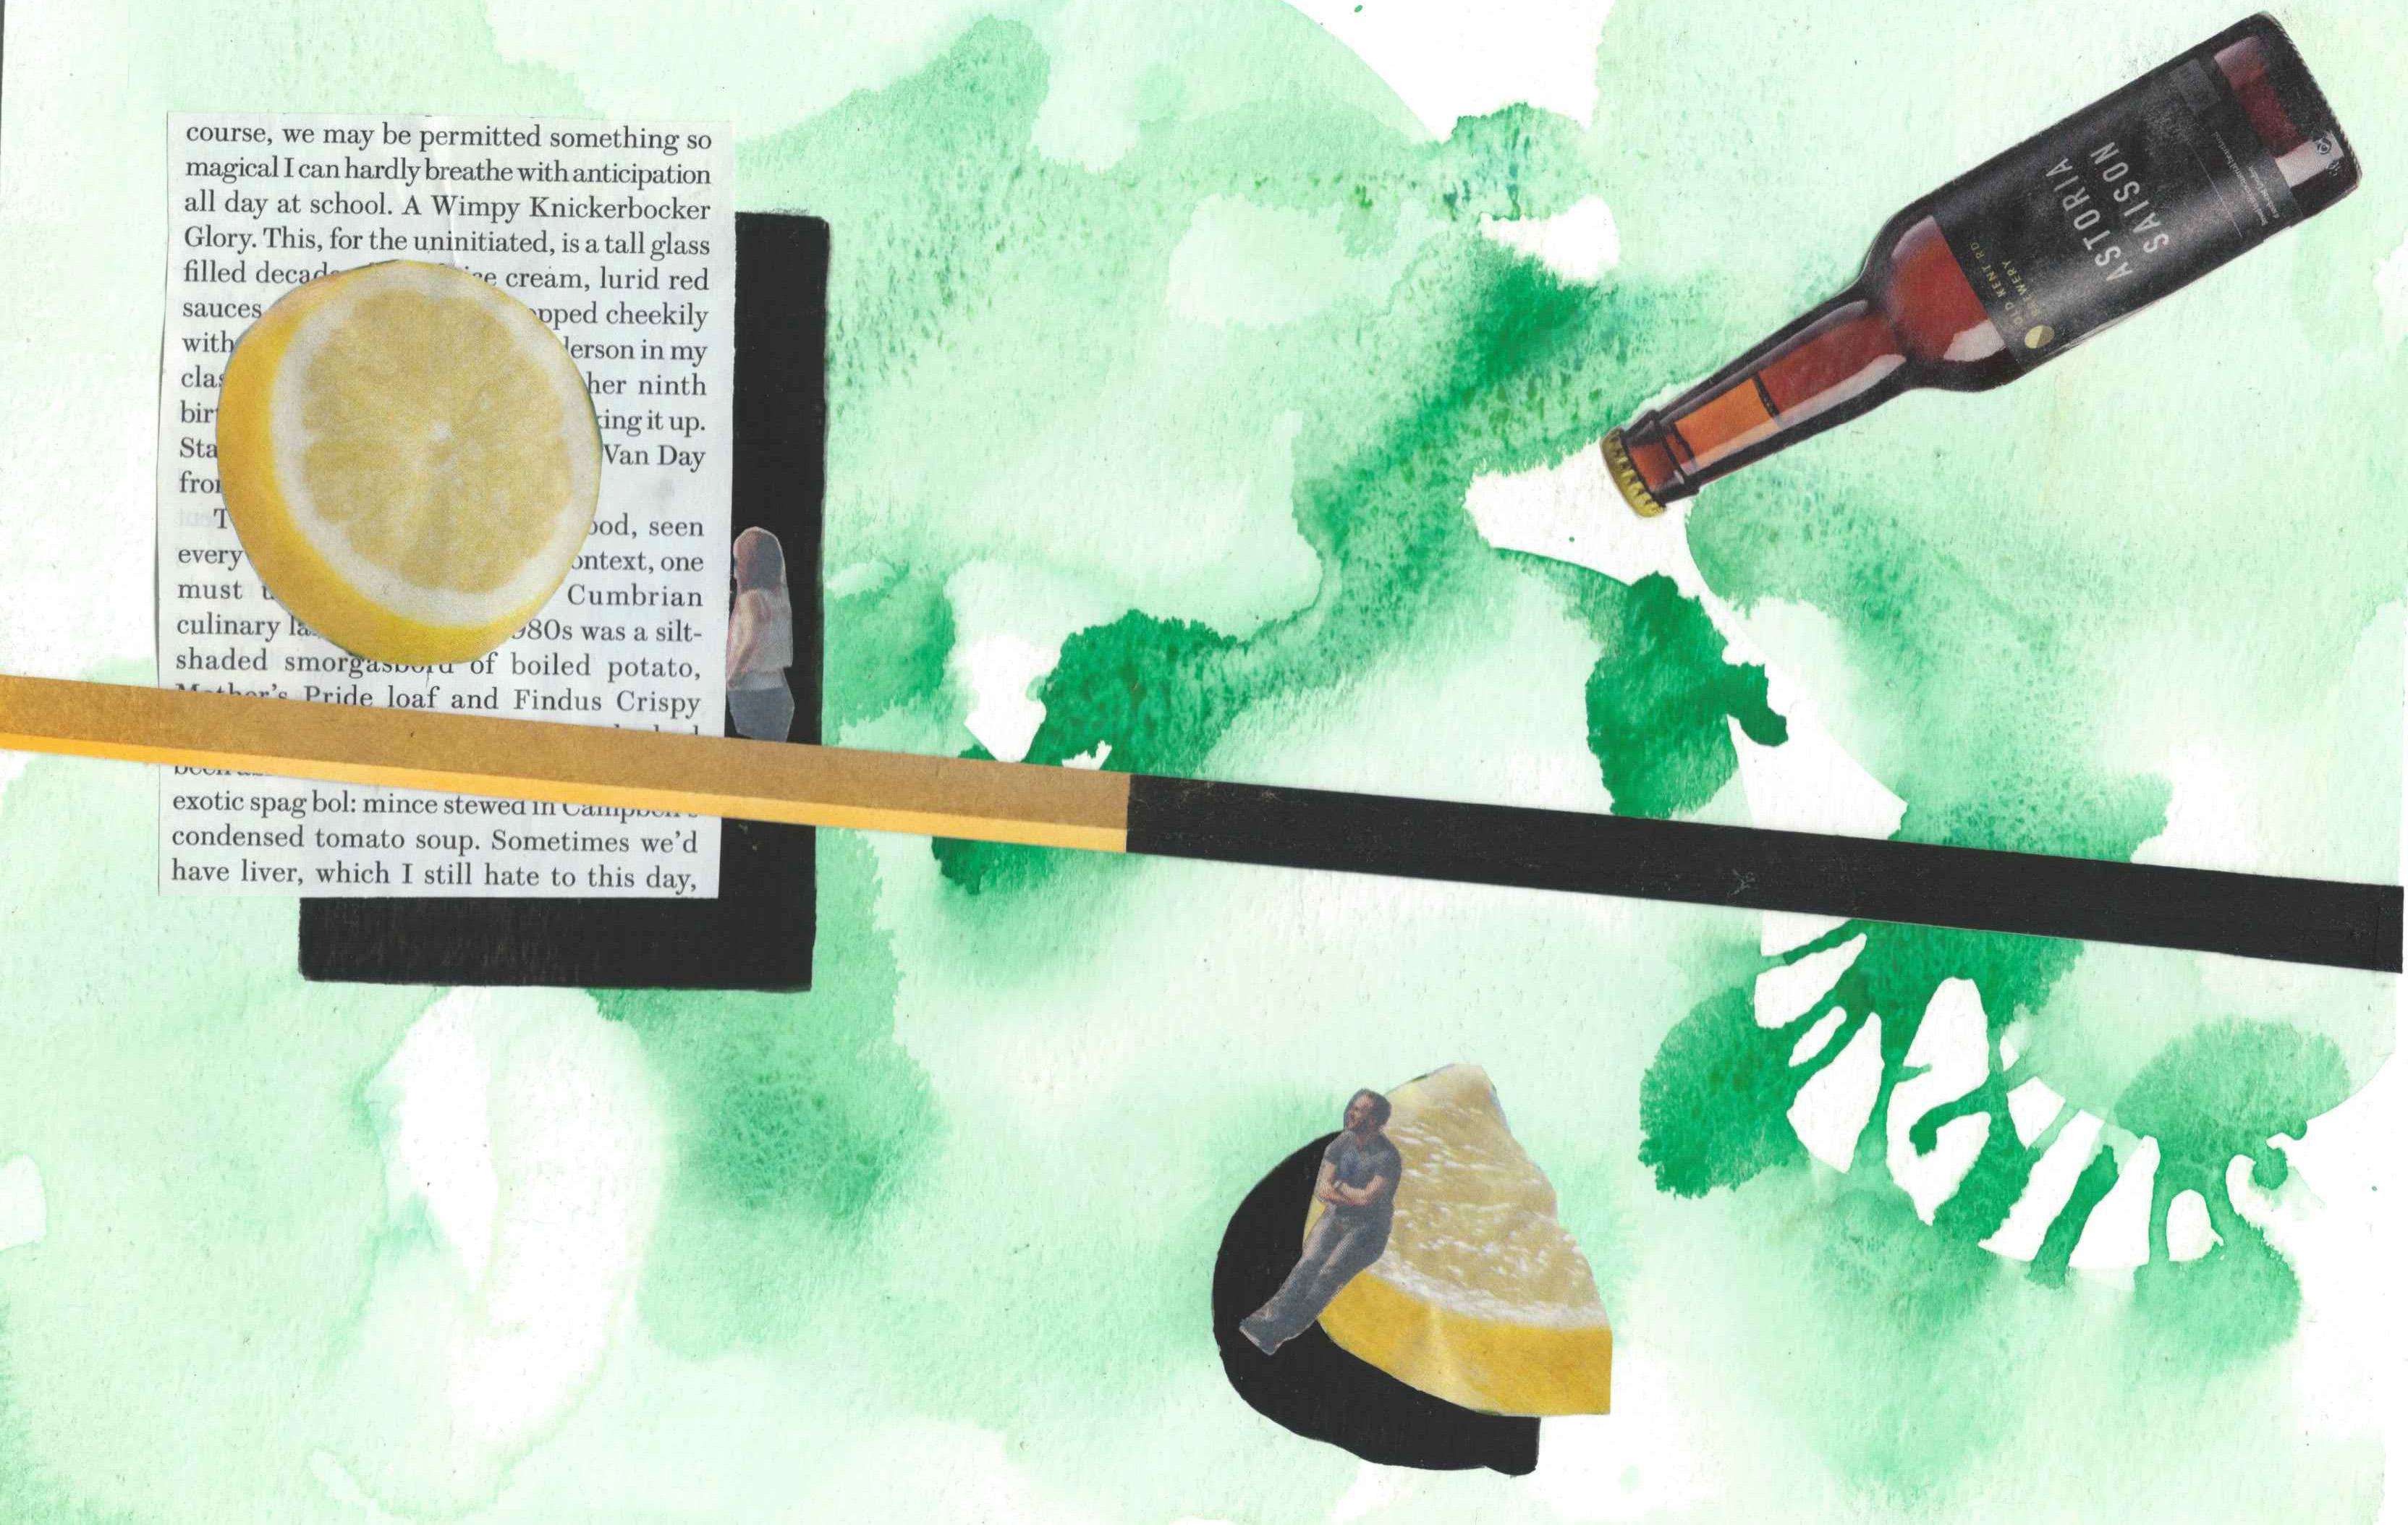 Lemon and the Floating World